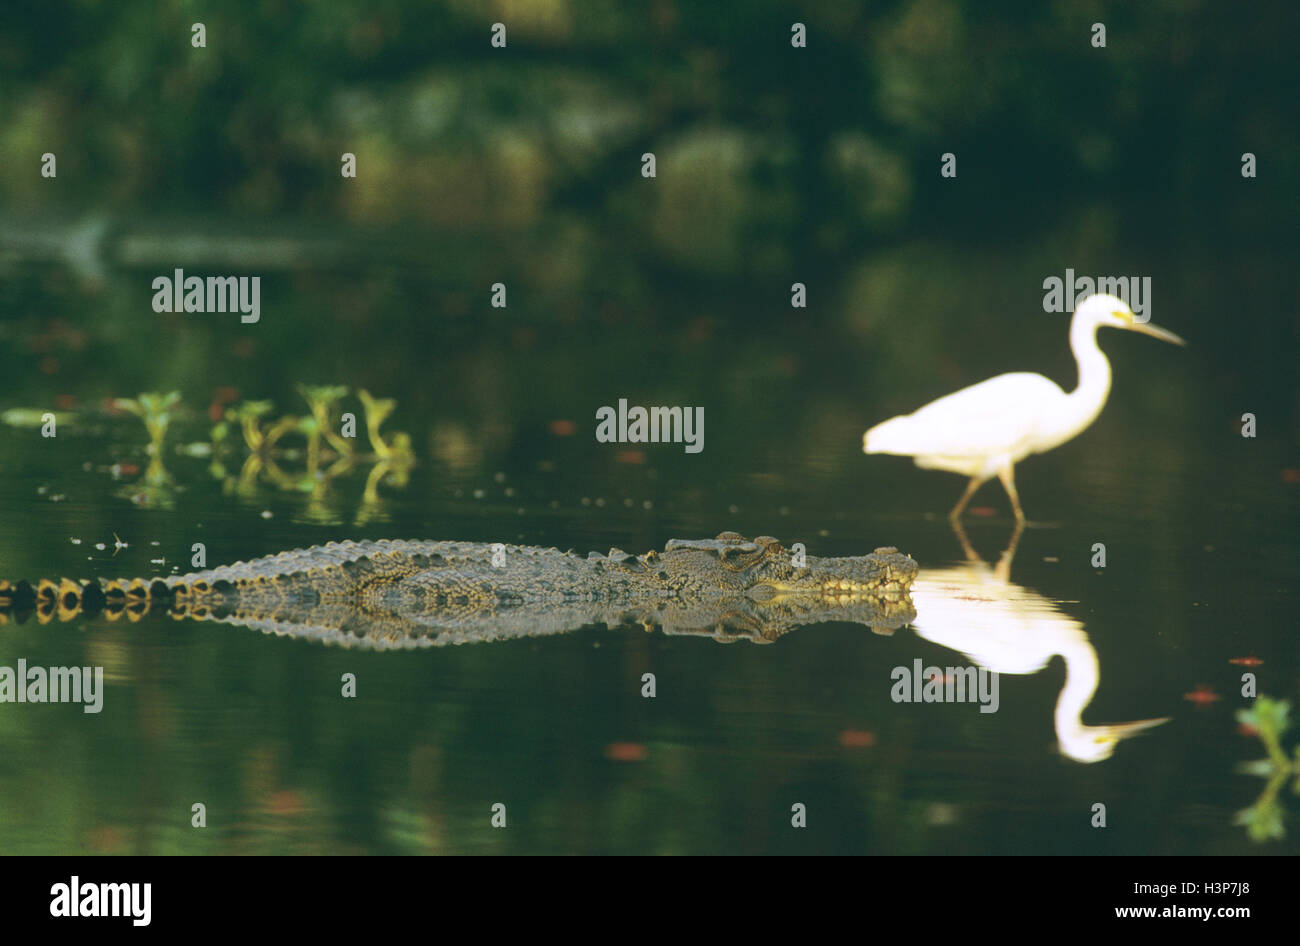 Estuarine crocodile (Crocodylus porosus) - Stock Image